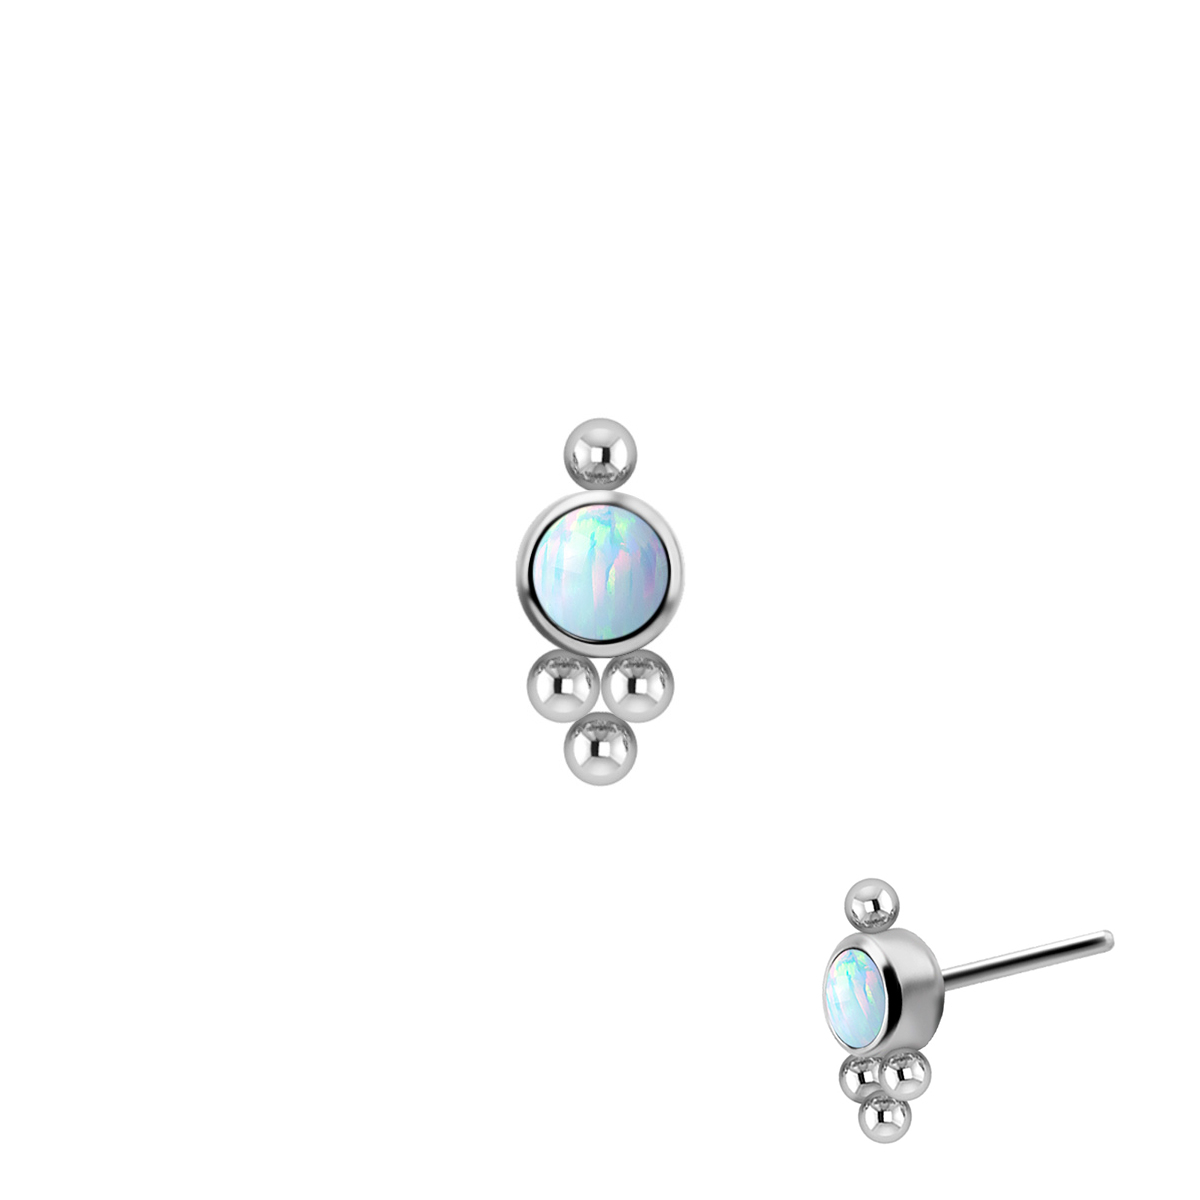 Opalit-topp - Push fit - Threadless piercingsmycke